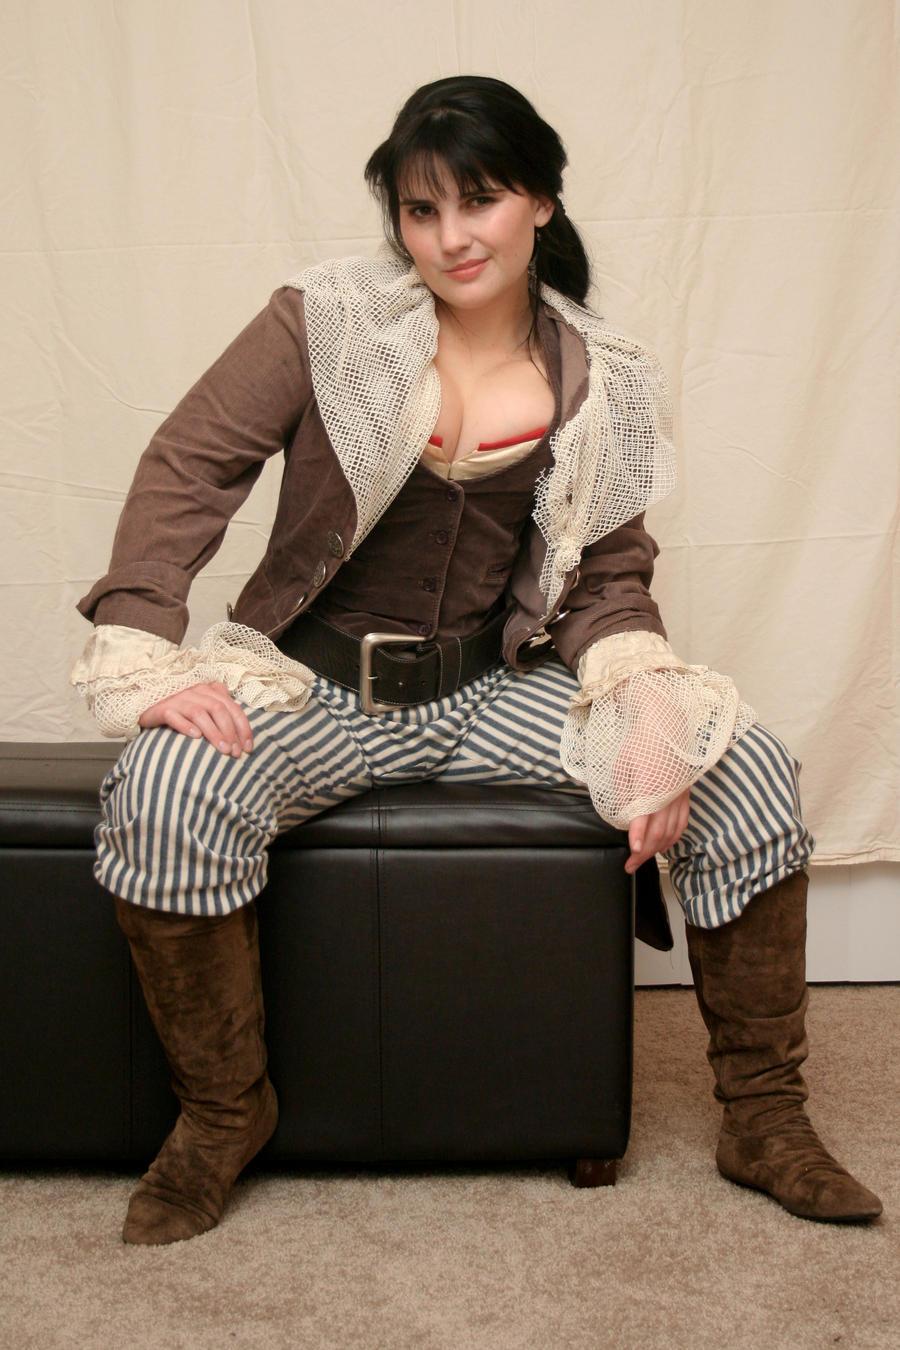 Becca 46 by PhotoStockMarket